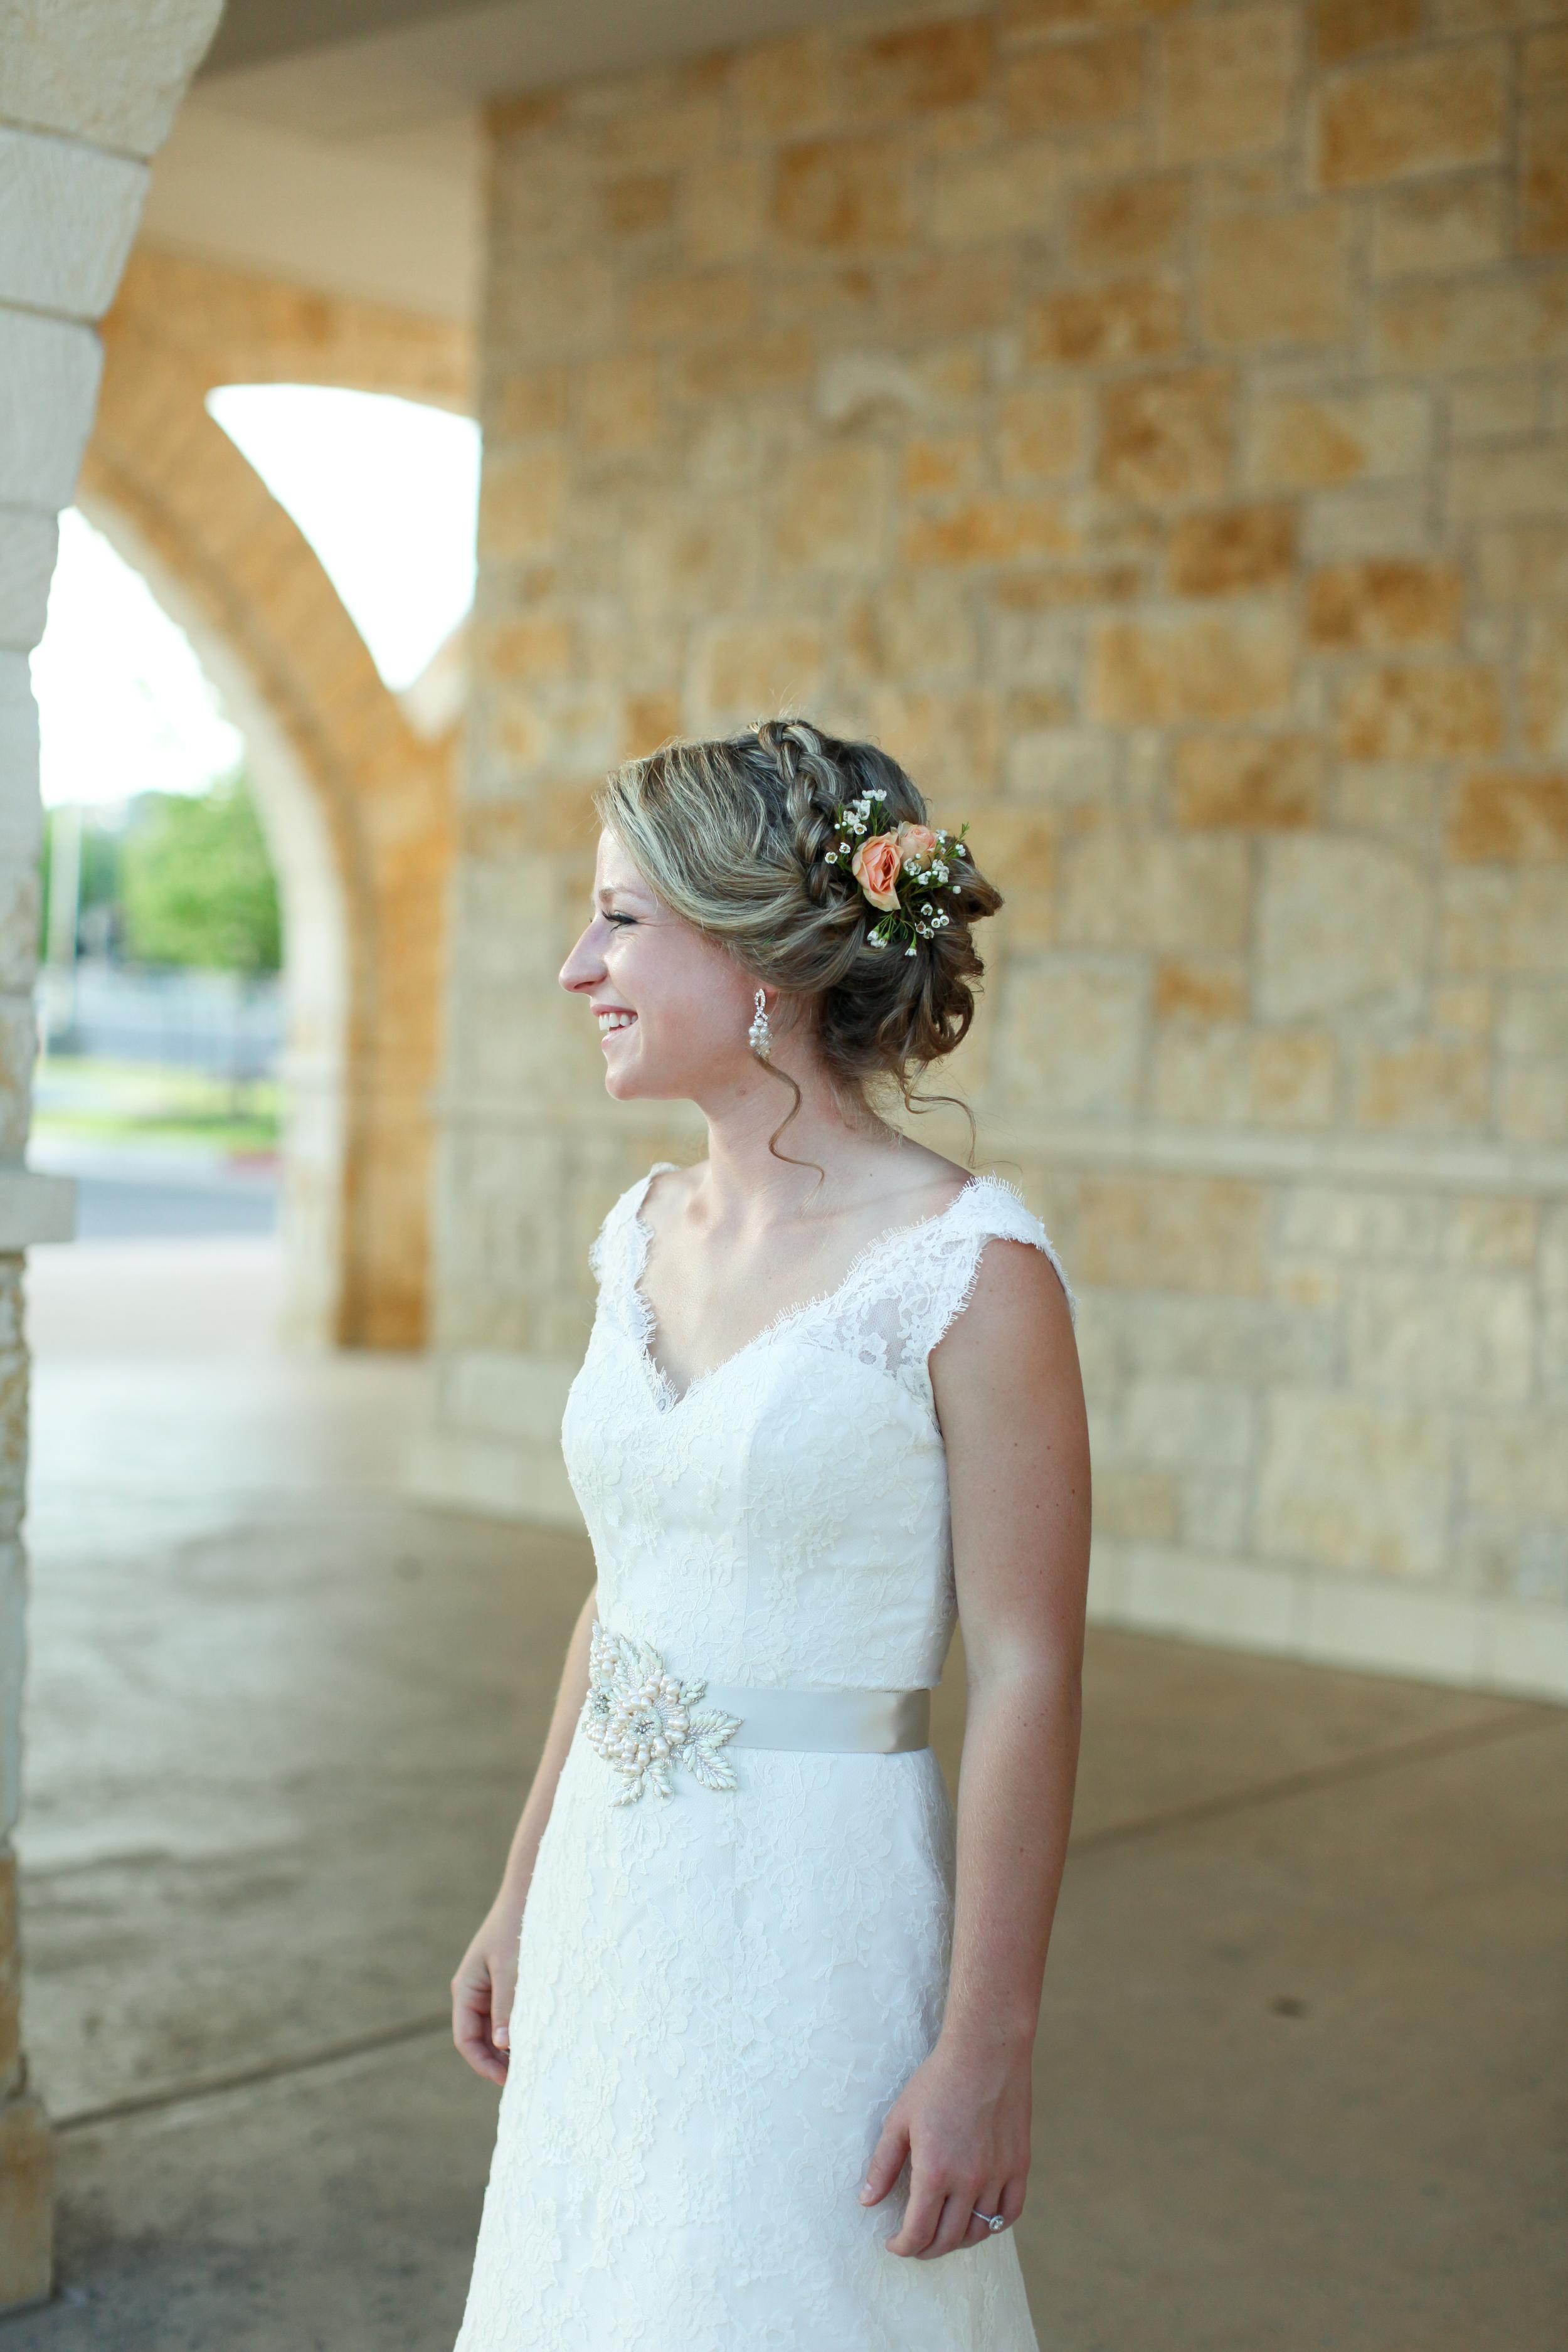 kate stafford austin bridals